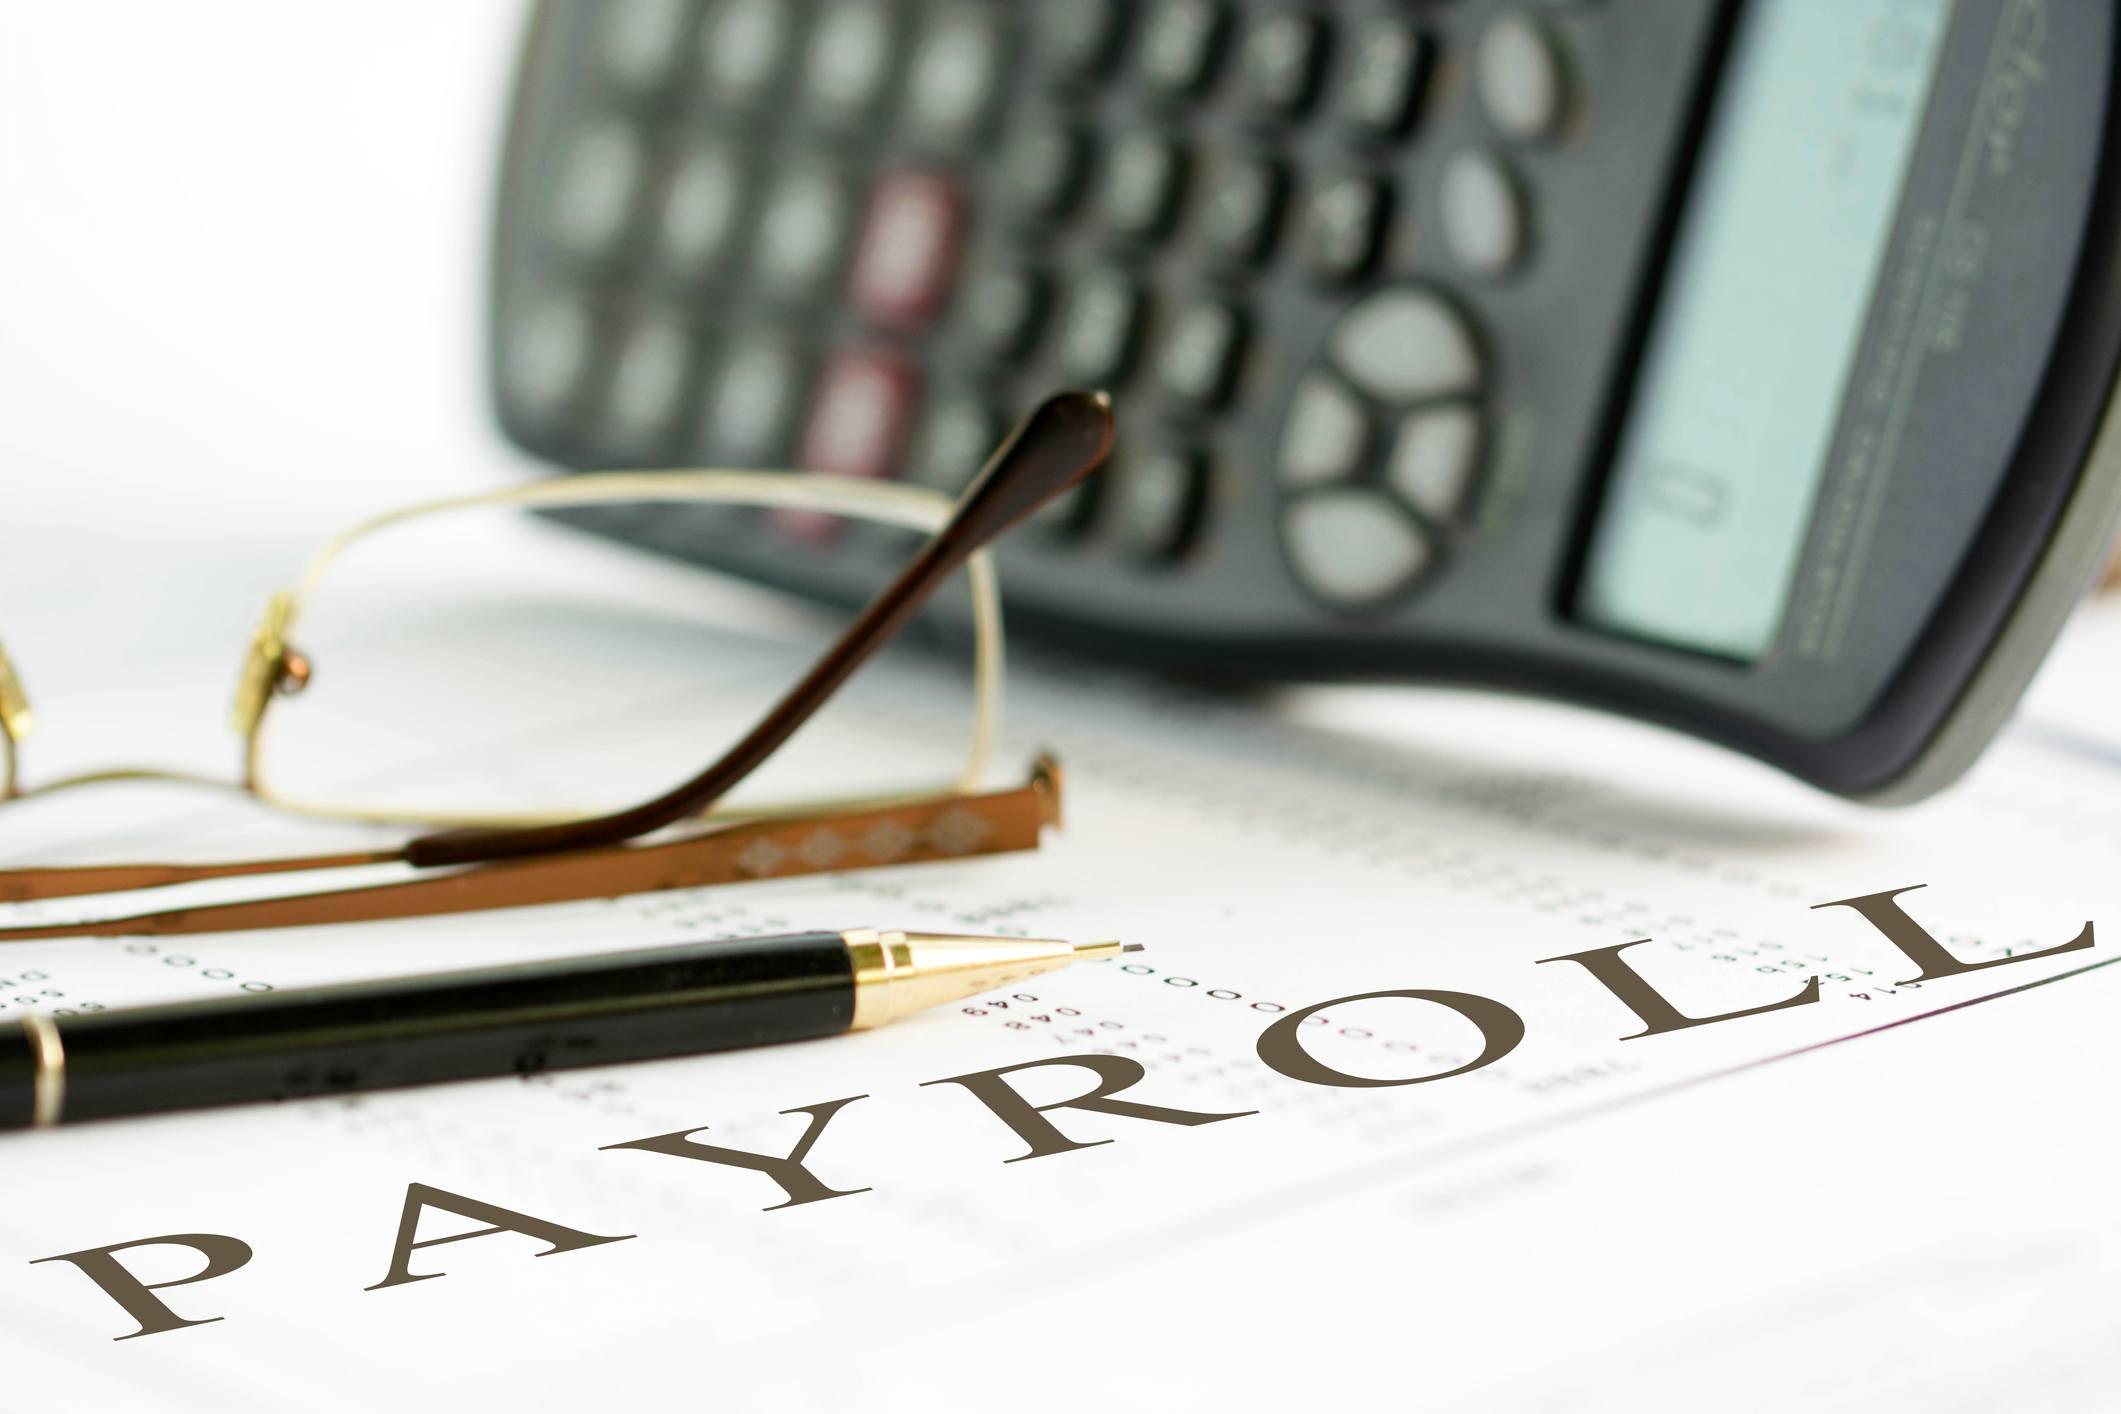 payroll sheet wtih pen and glasses